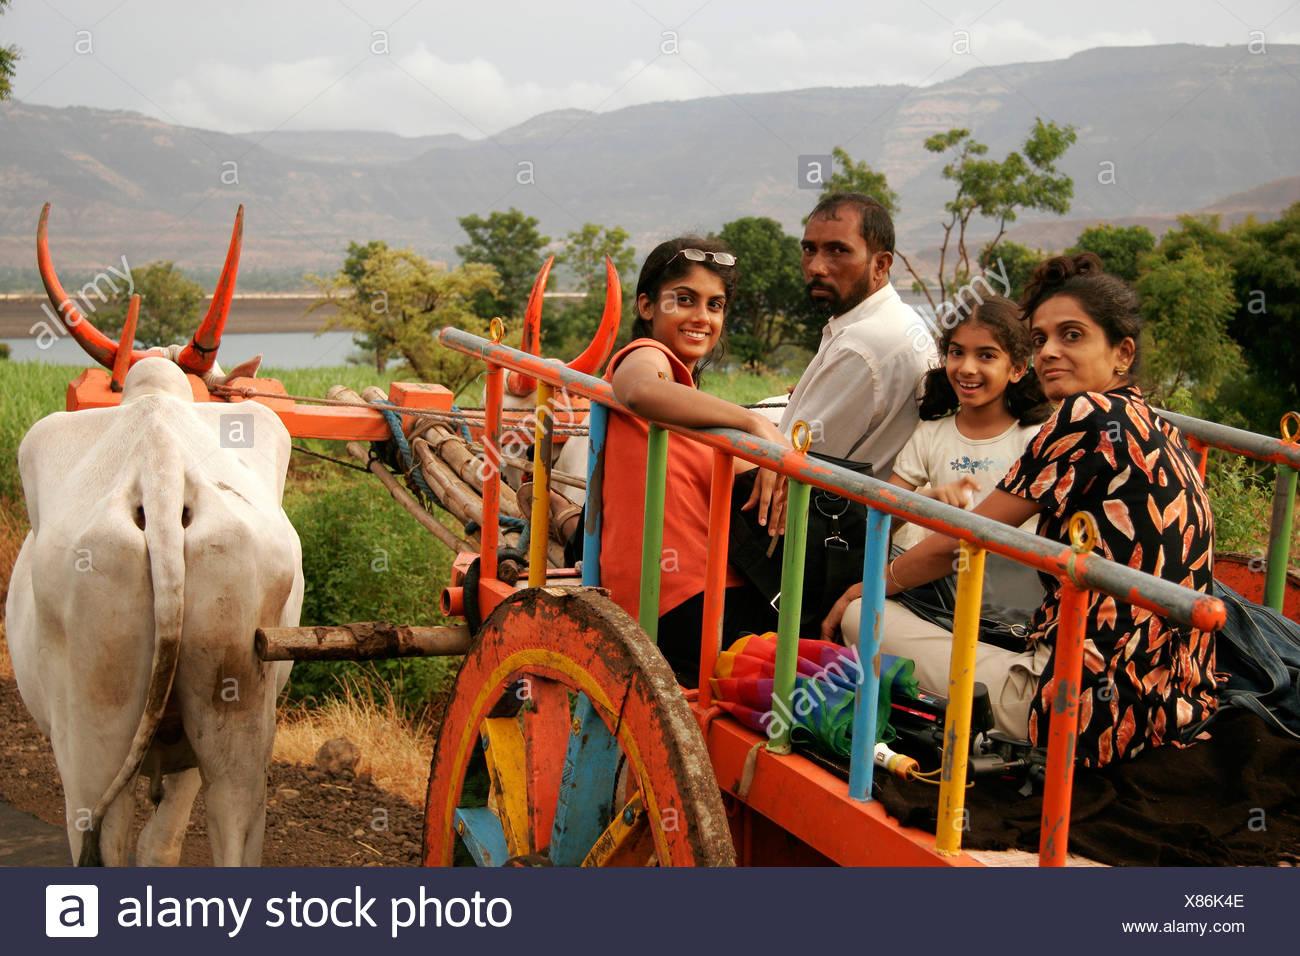 Mother and daughters enjoying bullock cart ride ; Wai ; Maharashtra ; India MR# 645;189;191 - Stock Image